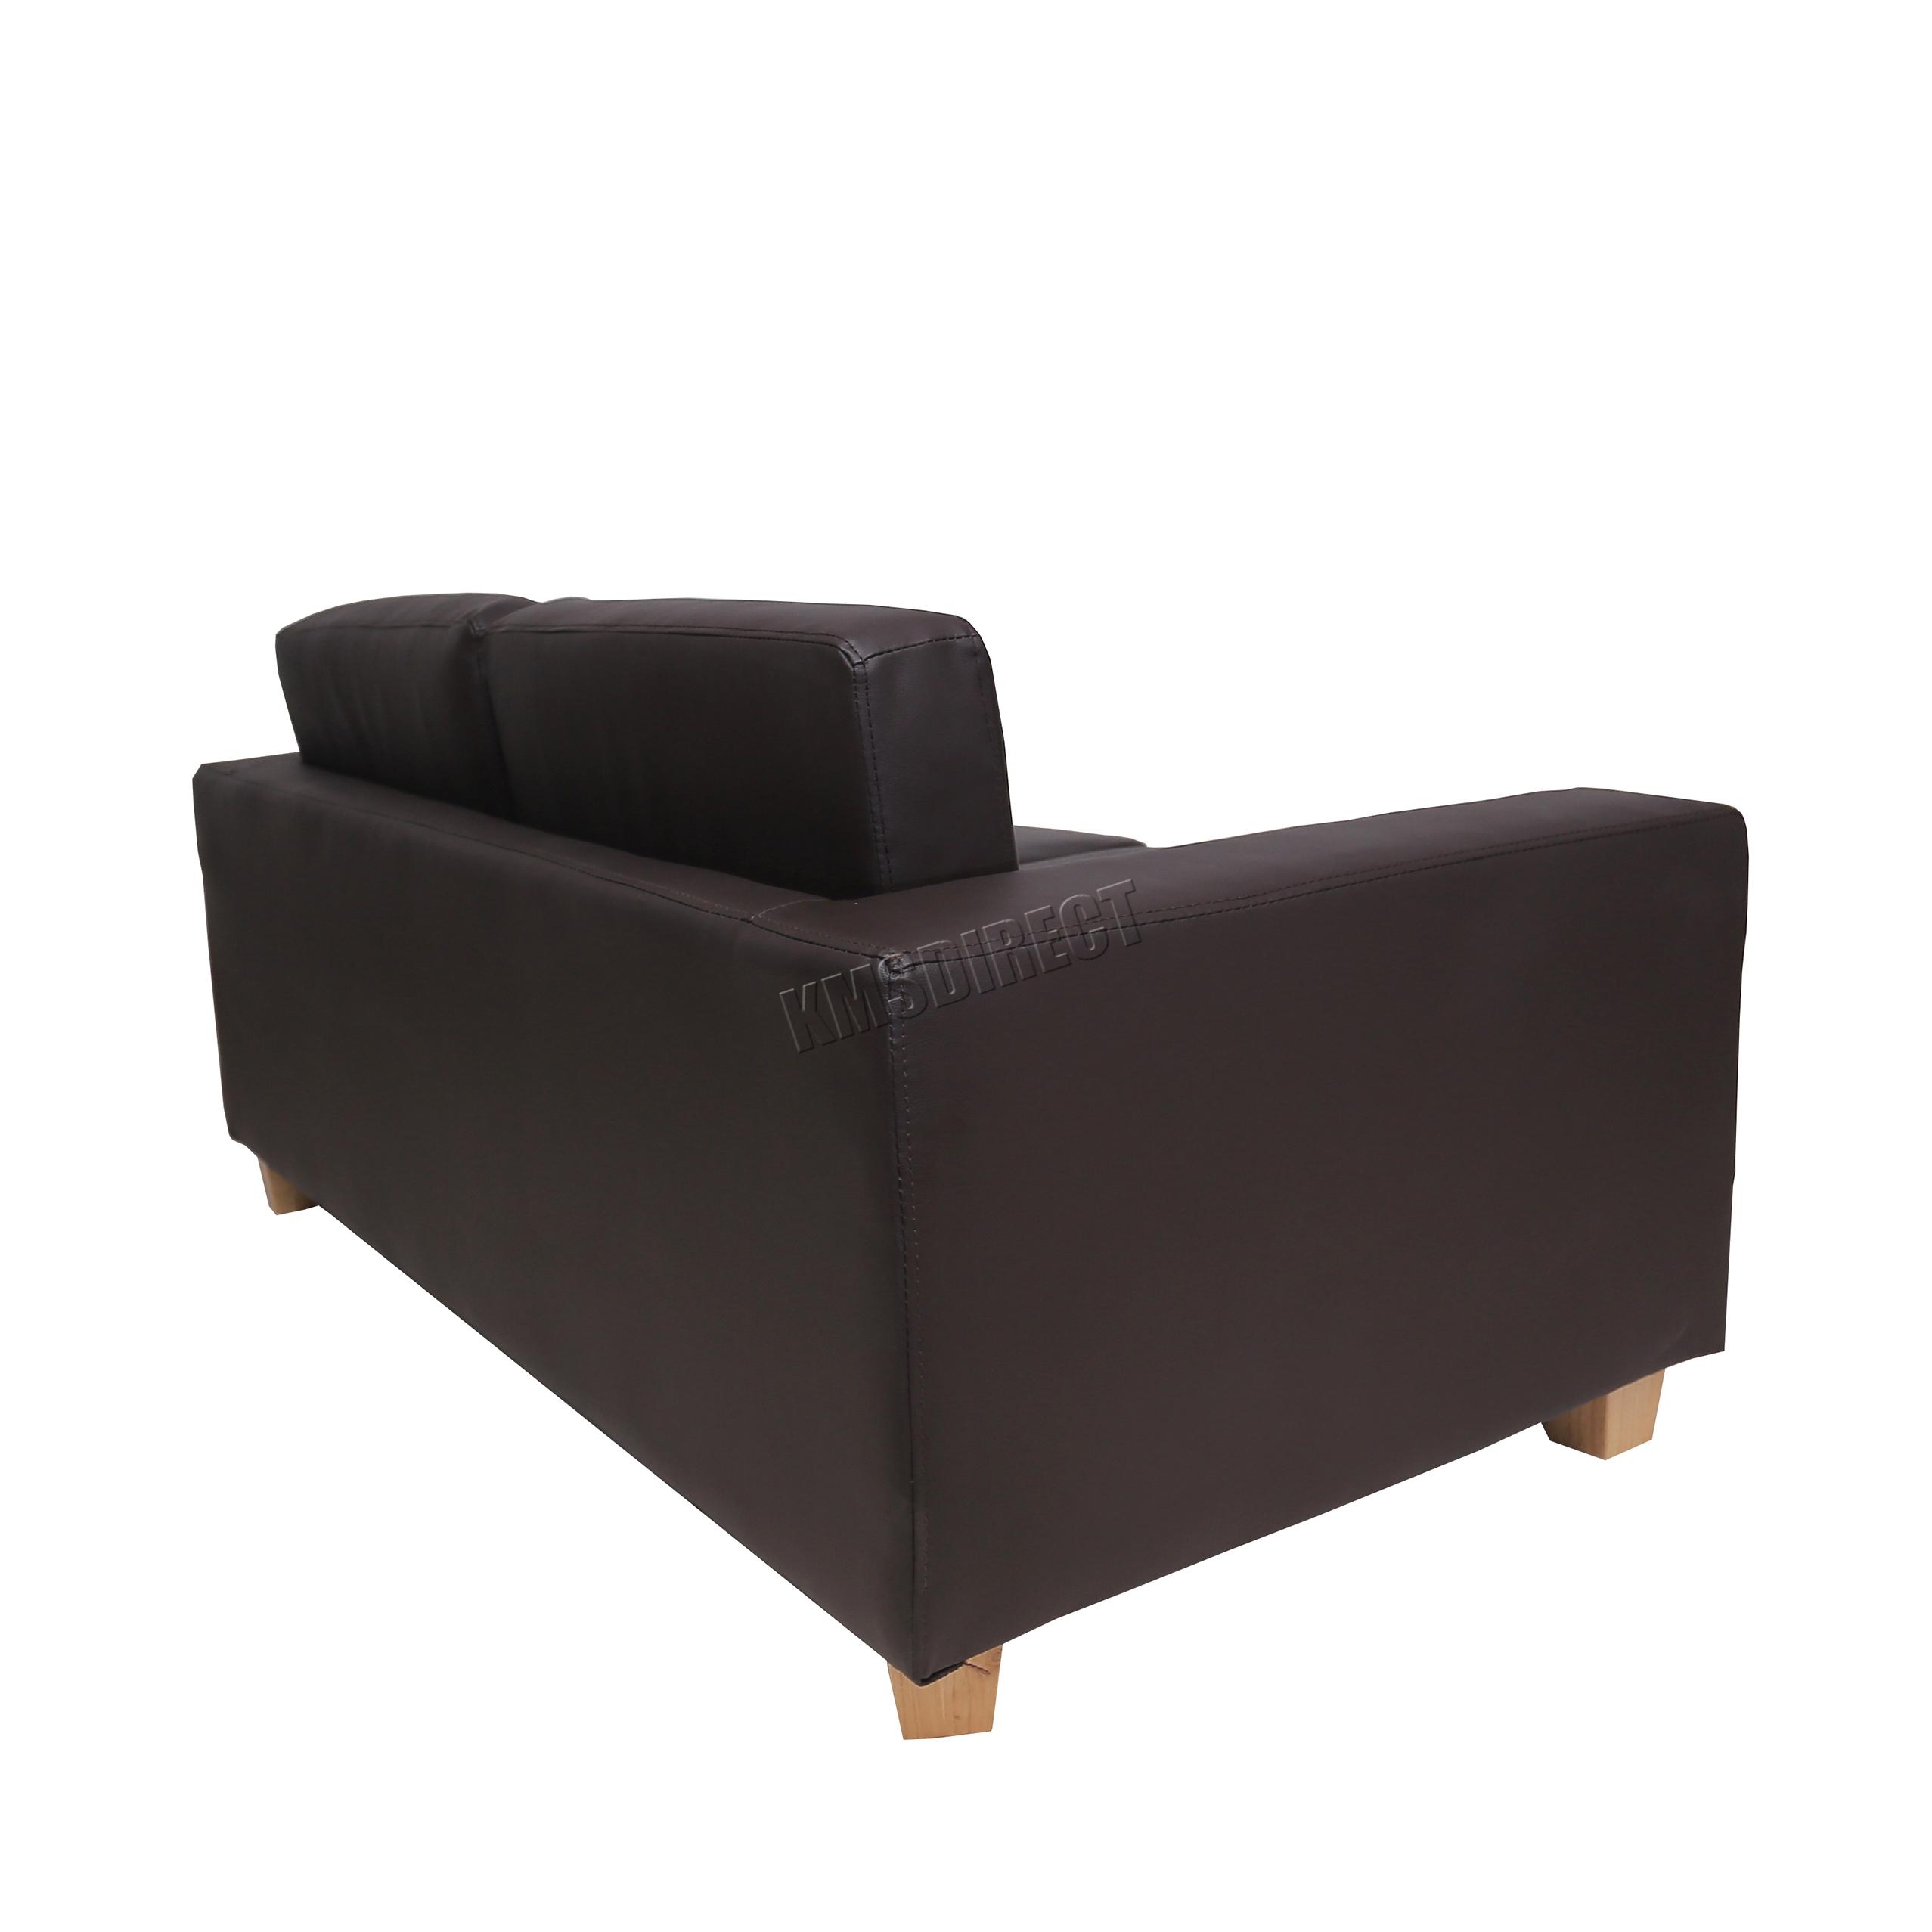 solsta sofa bed ransta dark gray 149 00 memory foam foxhunter pu 2 seater couch livingroom lounge home